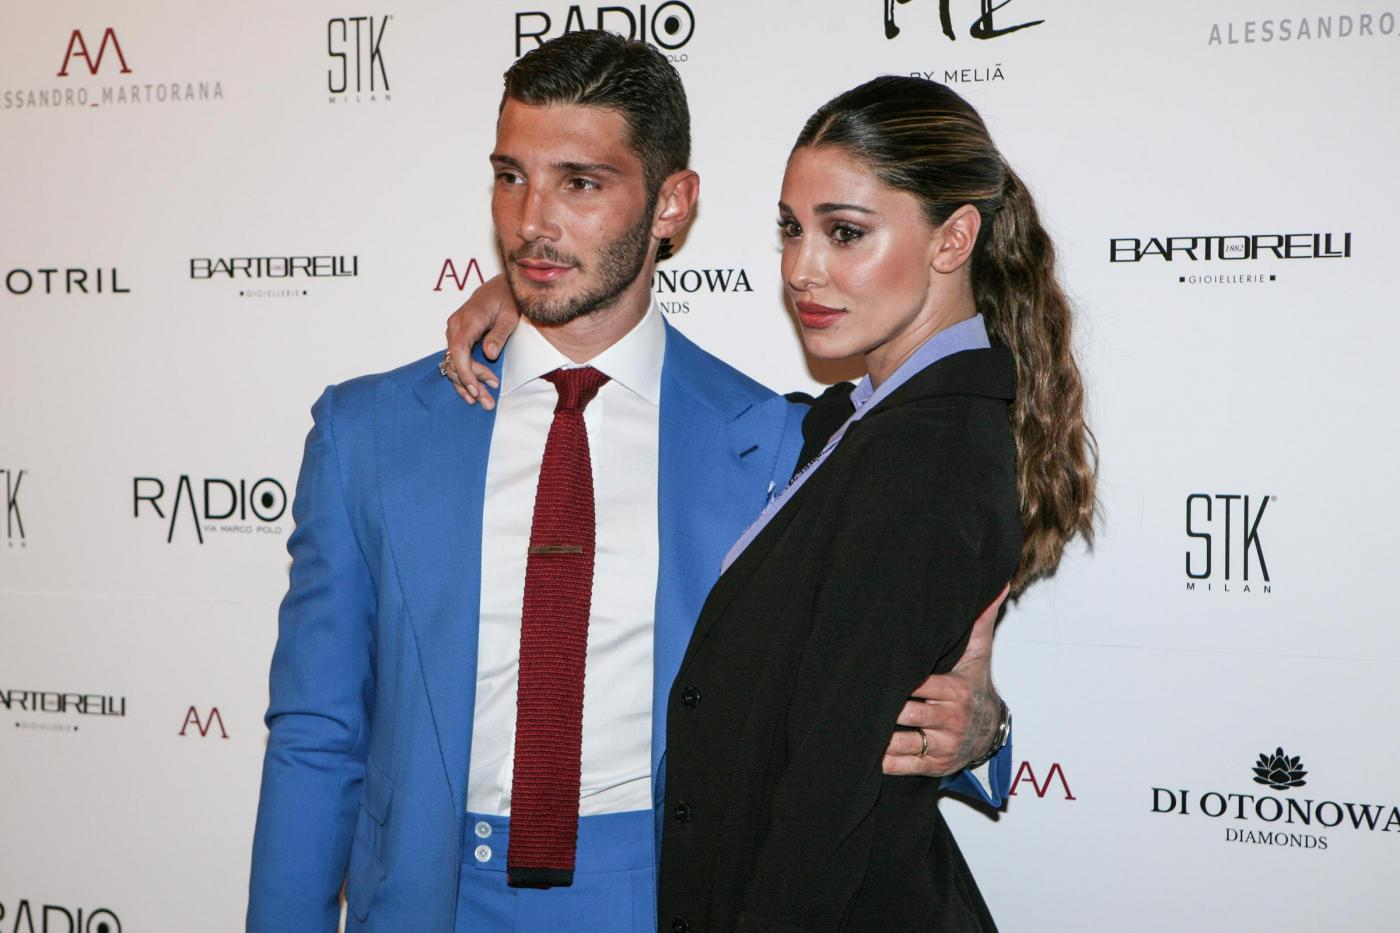 Belen e Stefano De Martino si sono separati